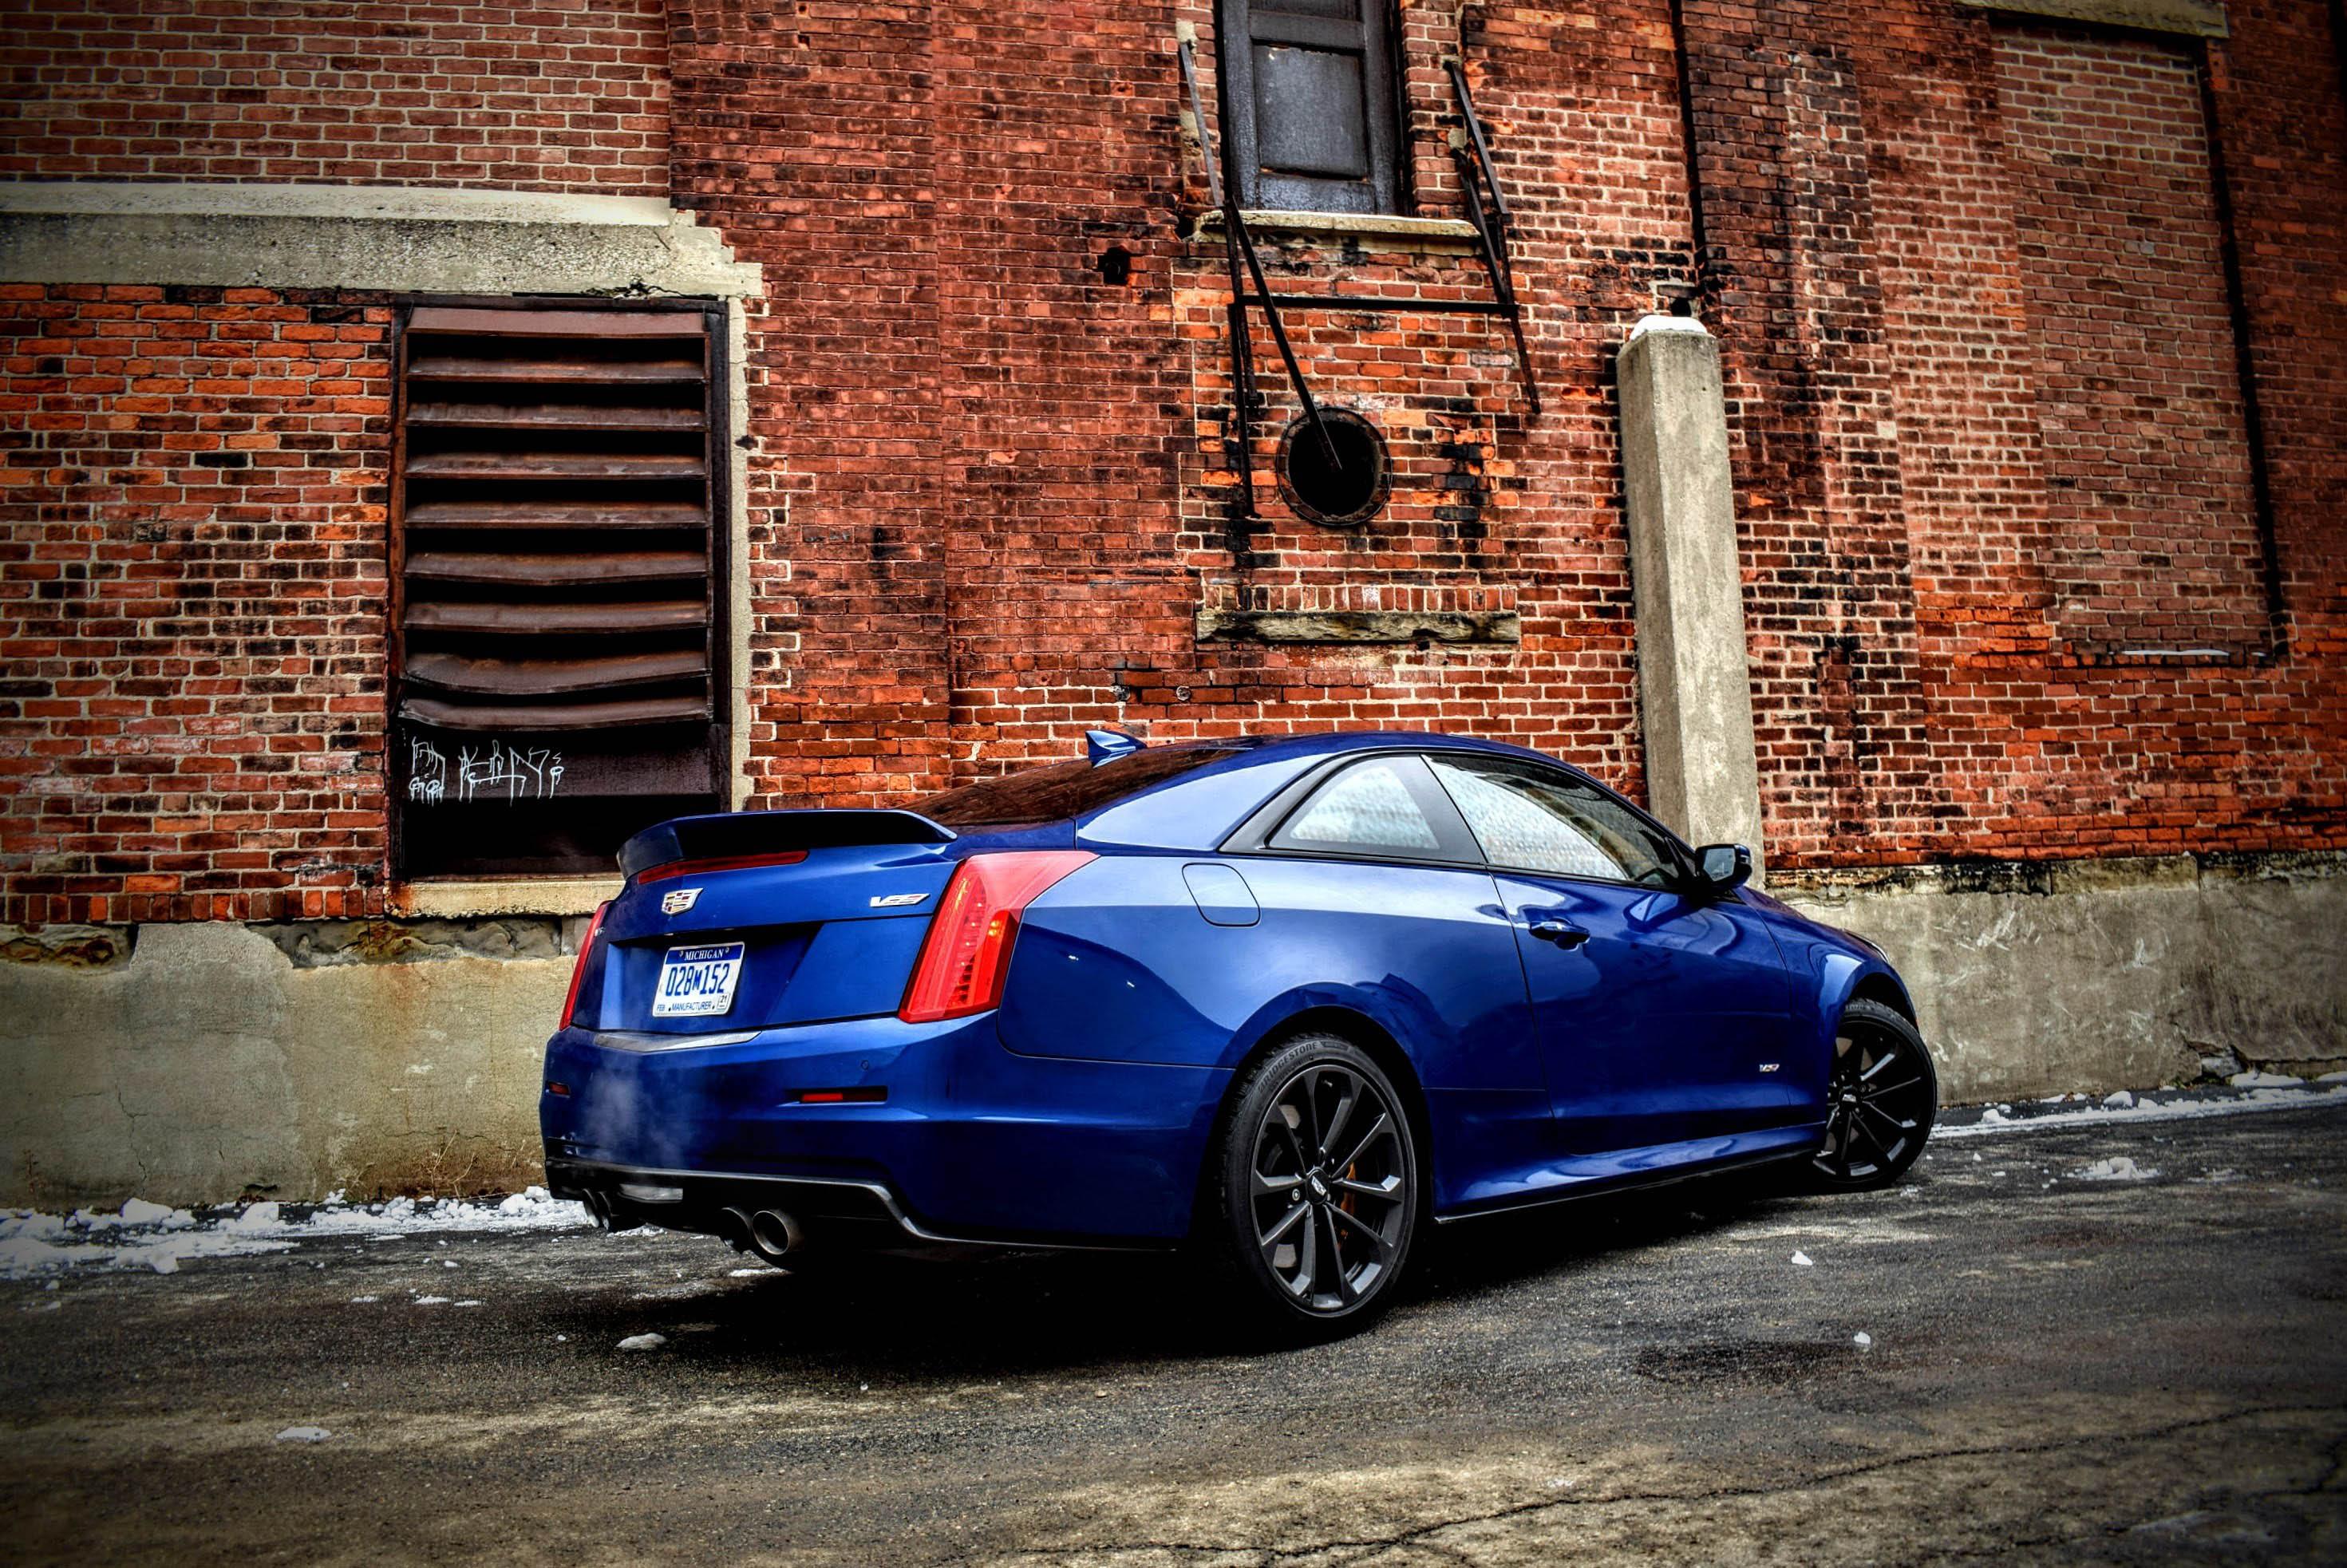 Cadillac Ats V Coupe >> Cadillac Ats V Coupe Review Six Speed Manual Turbo V6 Gm Power